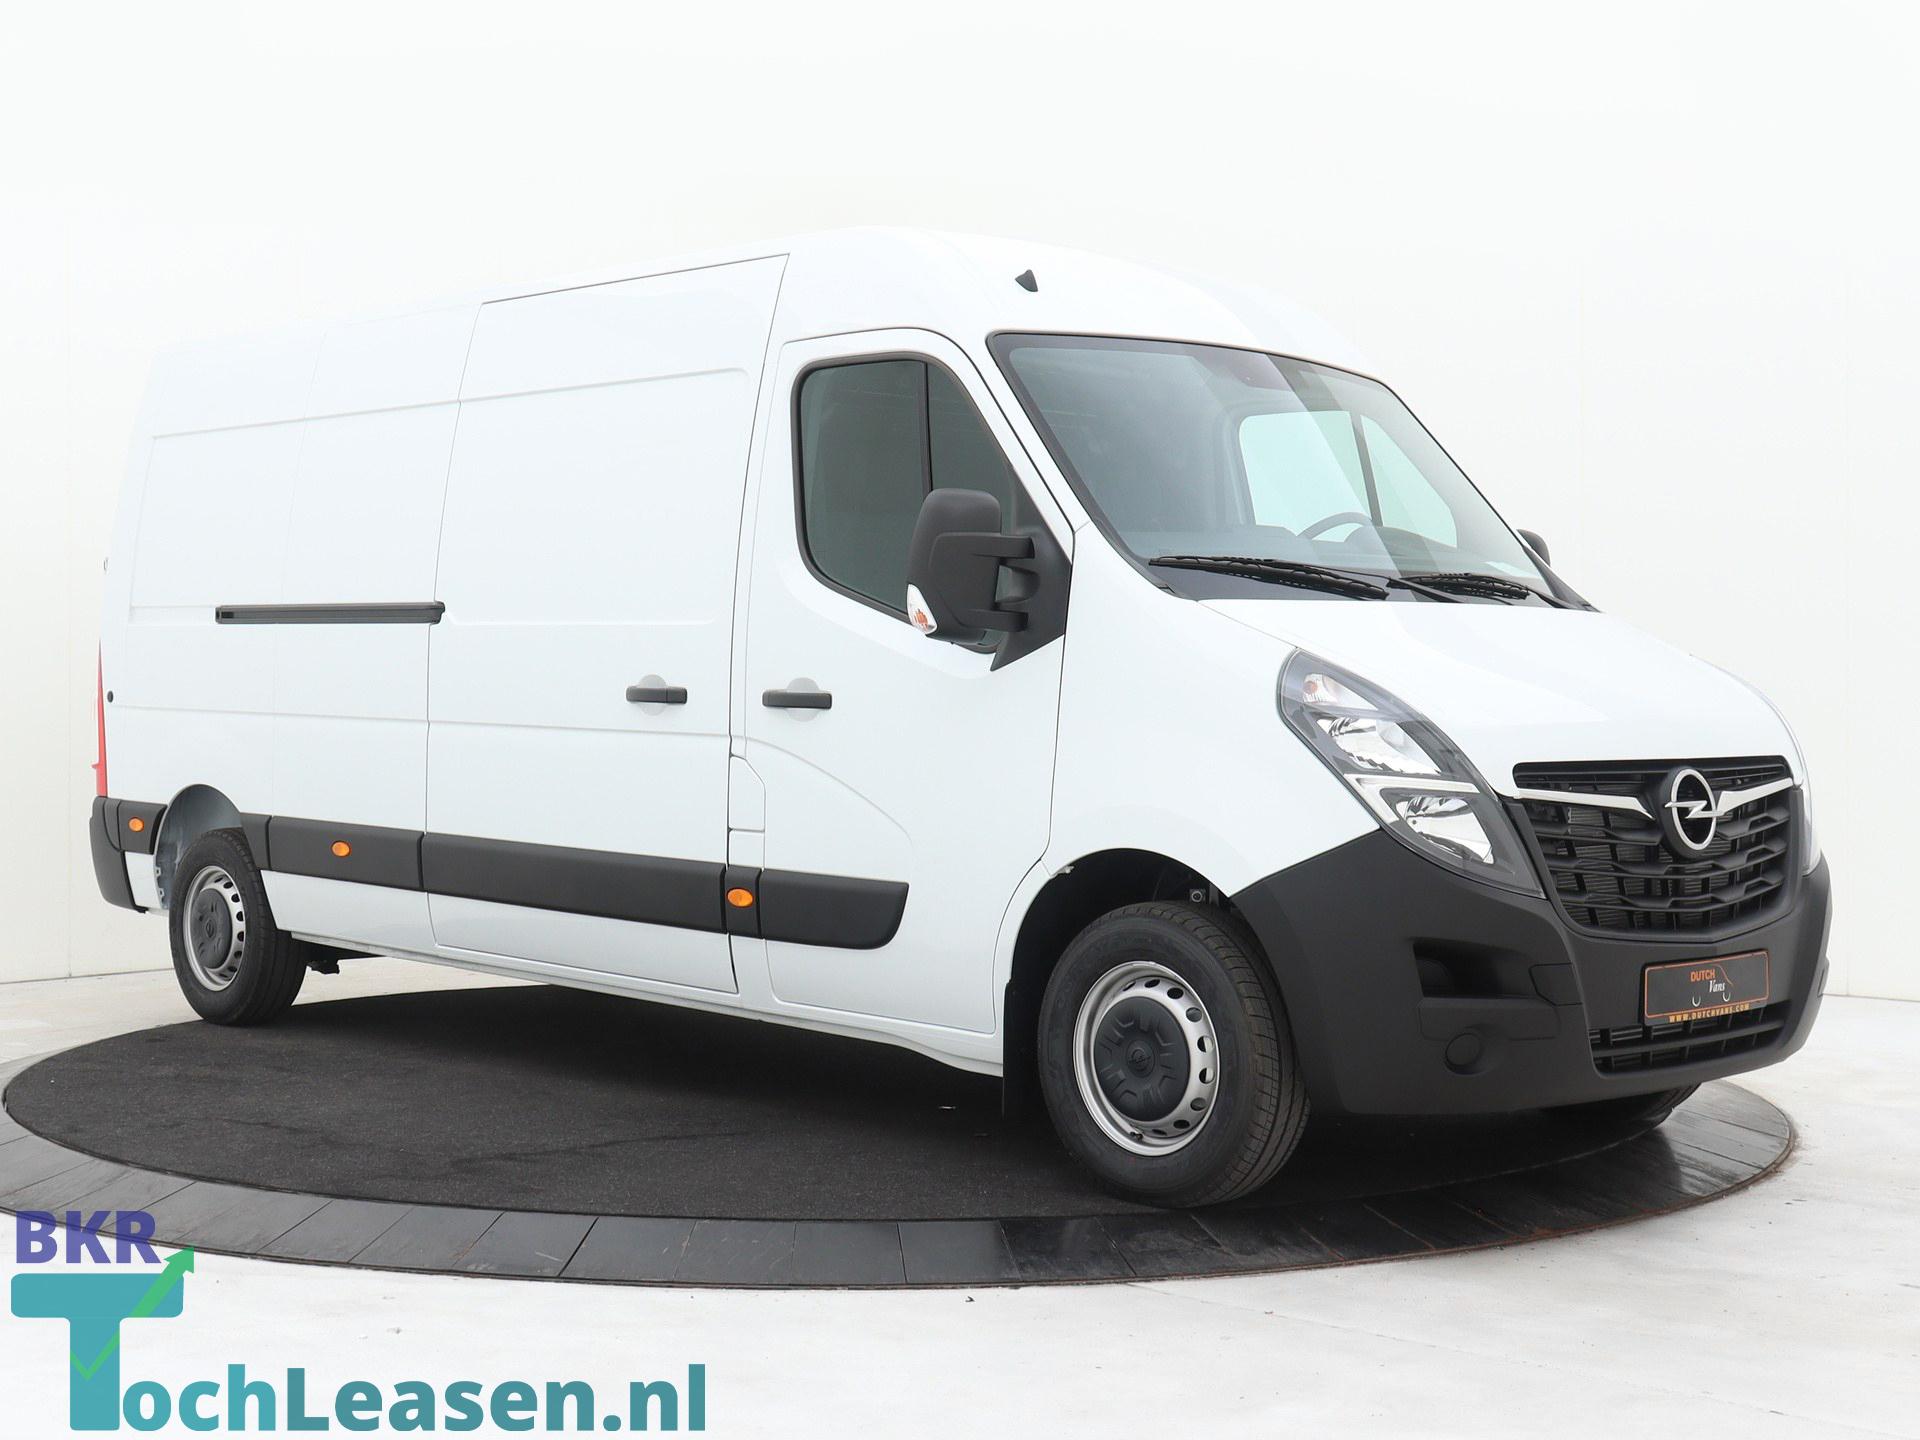 BKRTochLeasen.nl - Opel Movano - L3H2 - wit 15